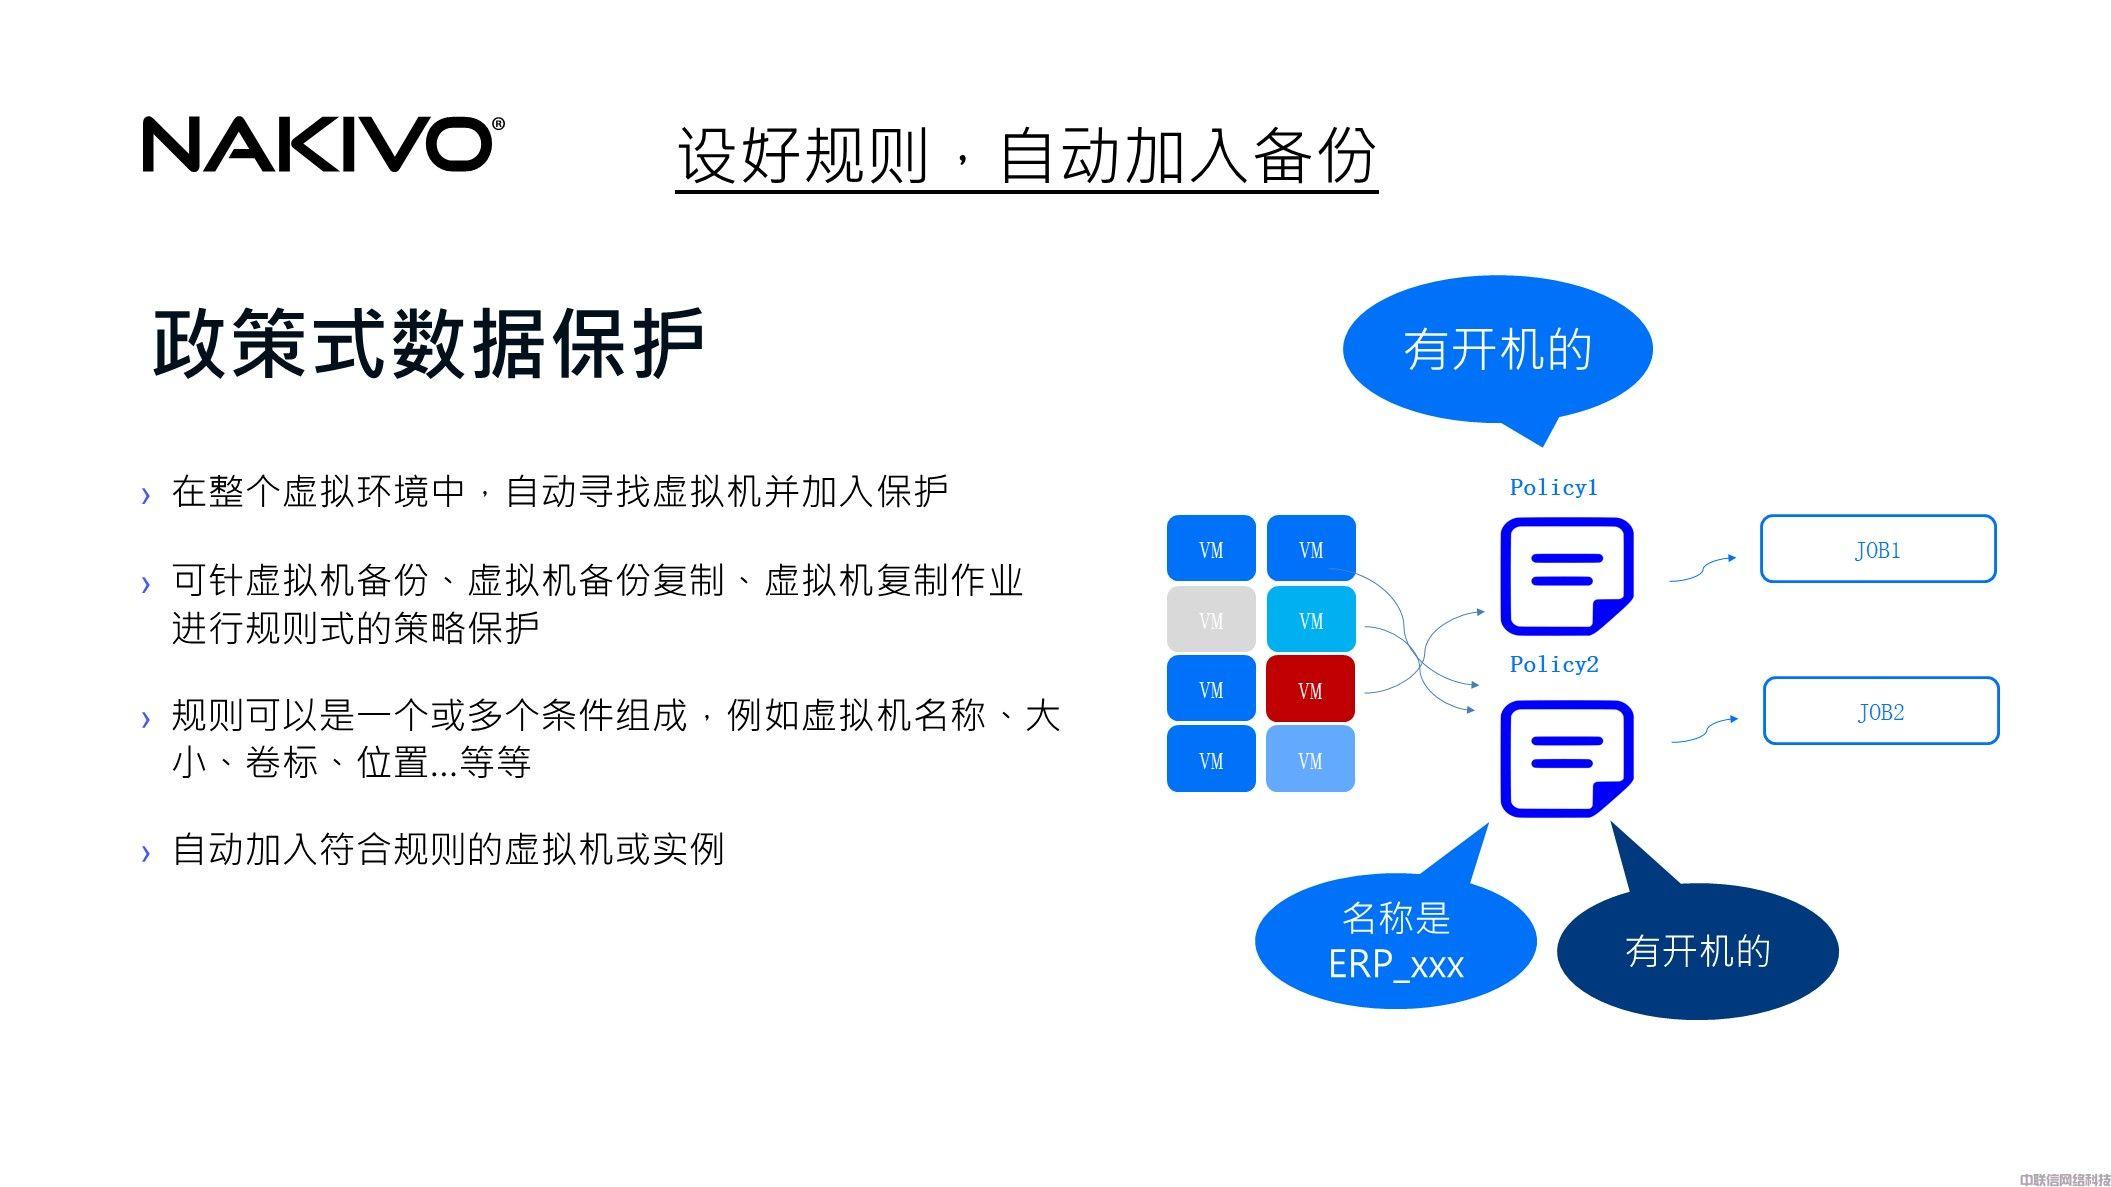 虚拟化备份方案NAKIVO Backup & Replication(图17)